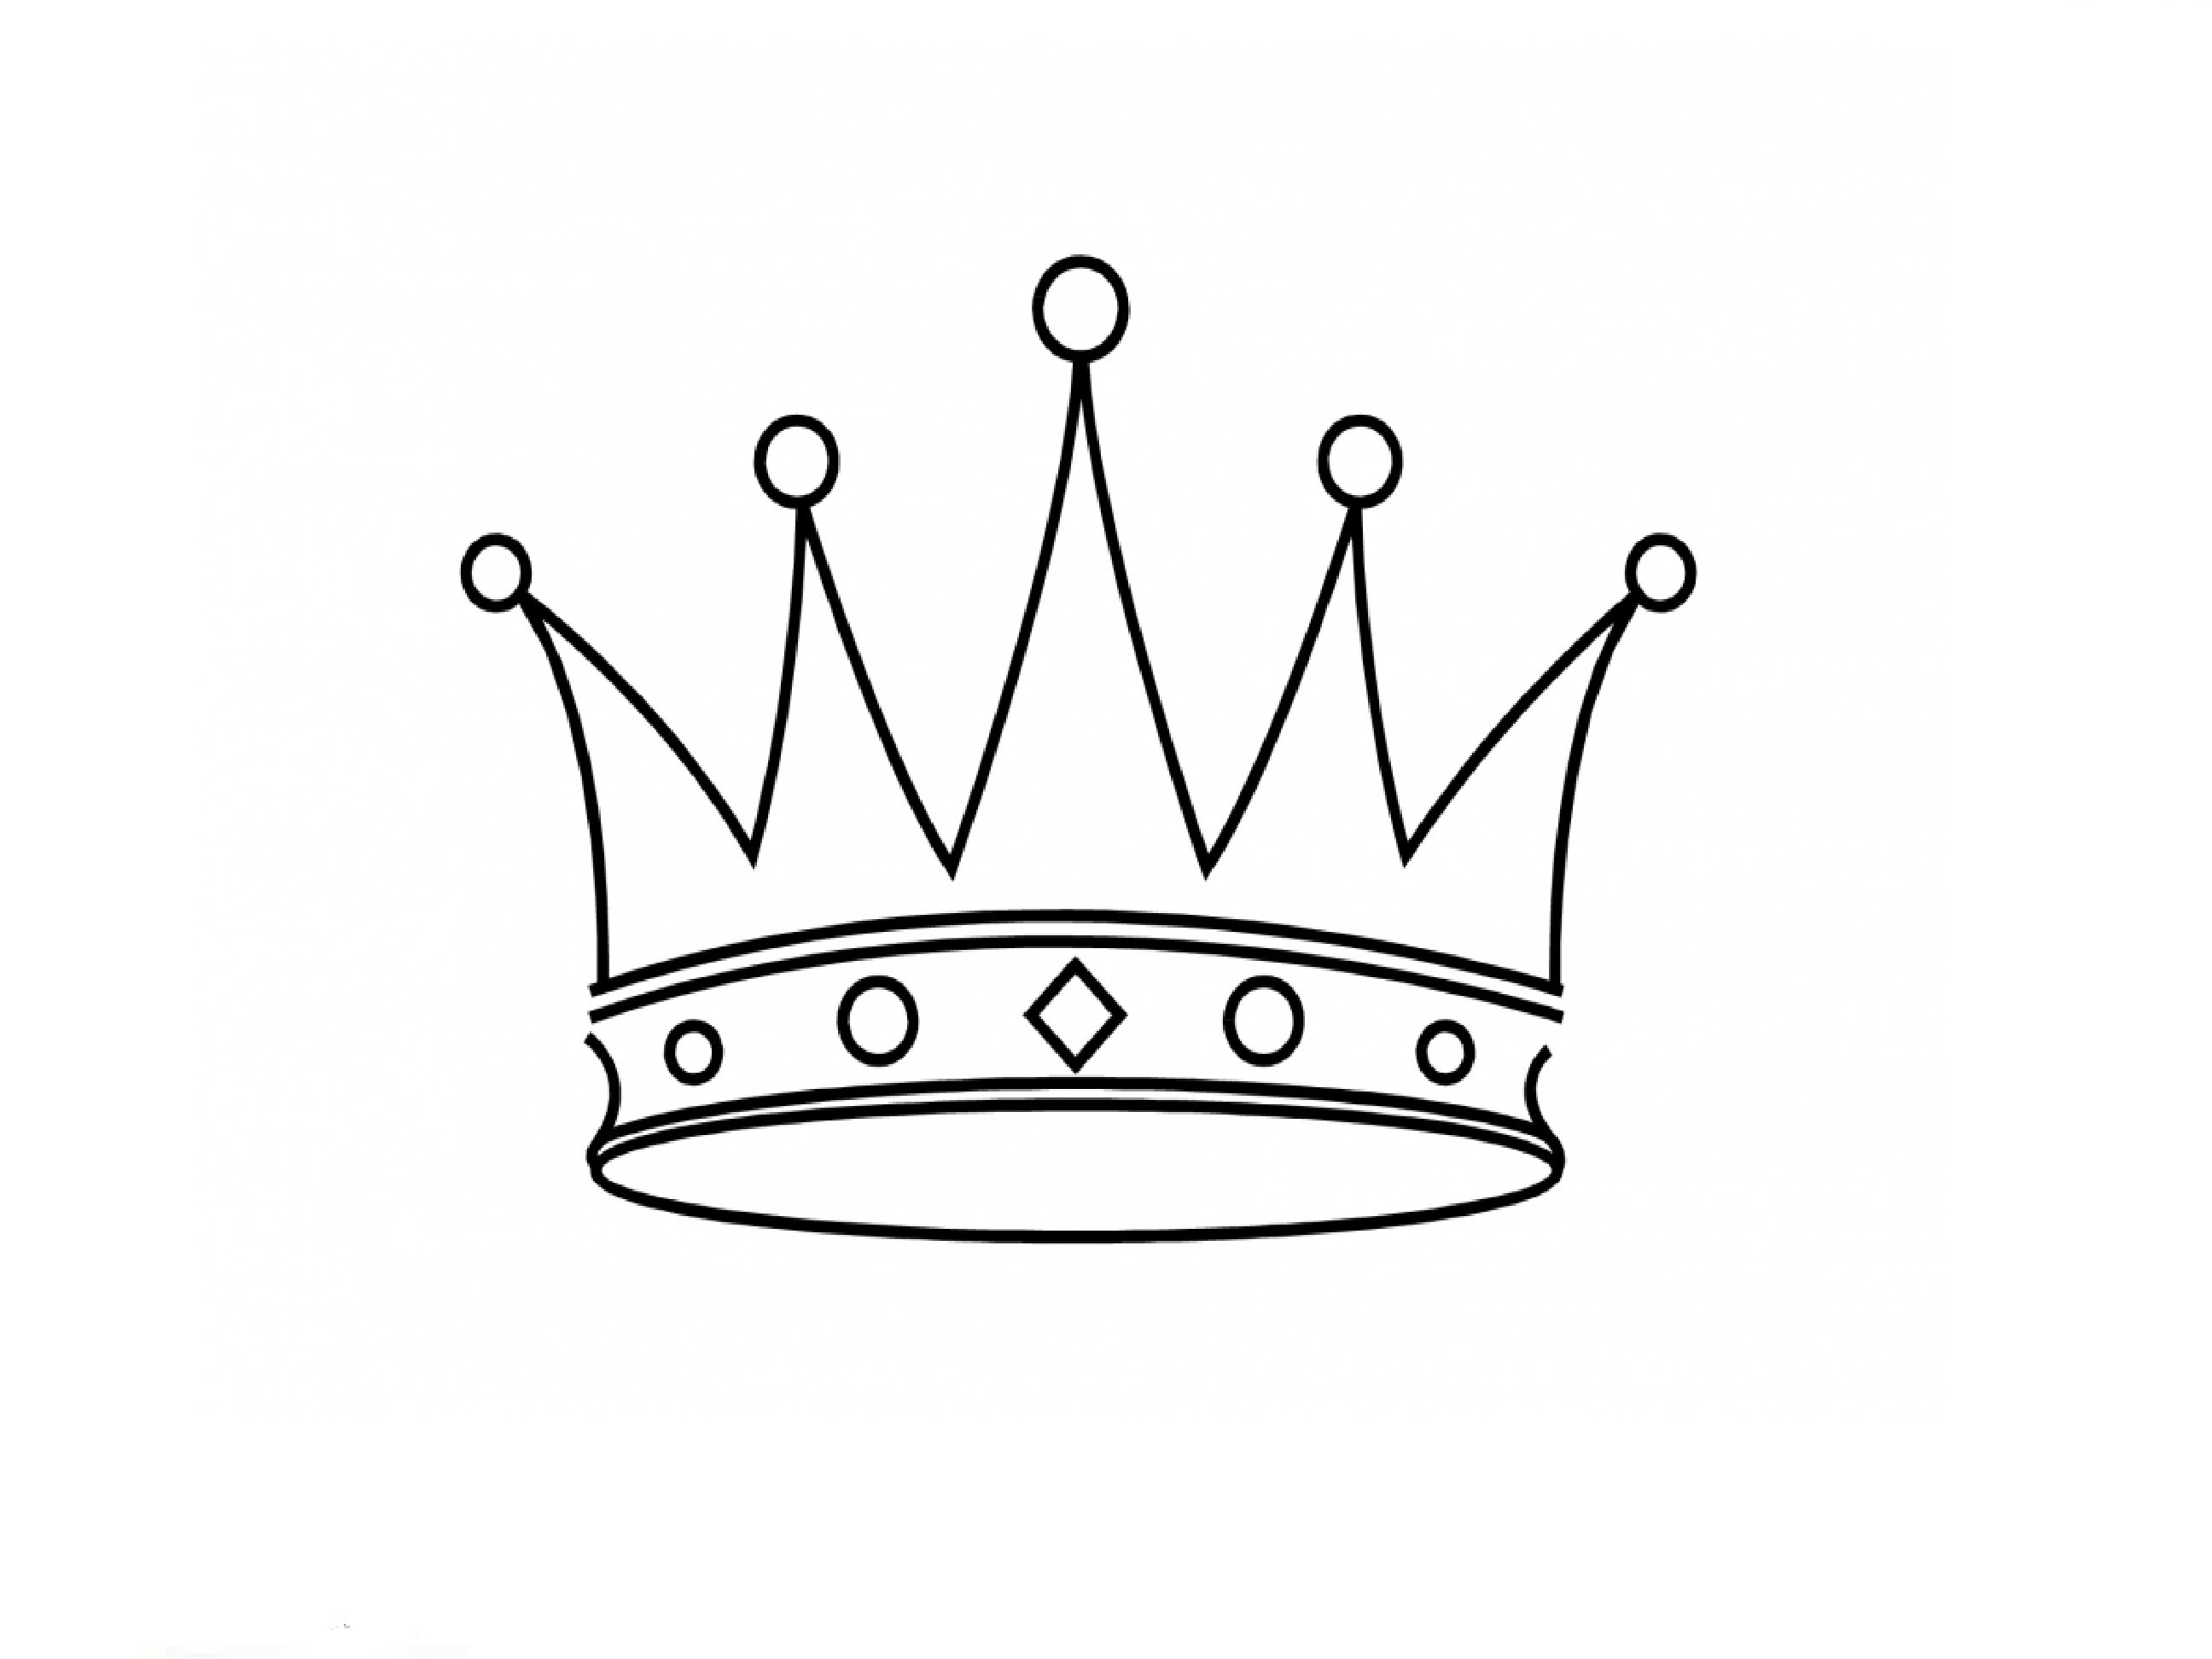 2592x1944 Crown Drawing Free Download